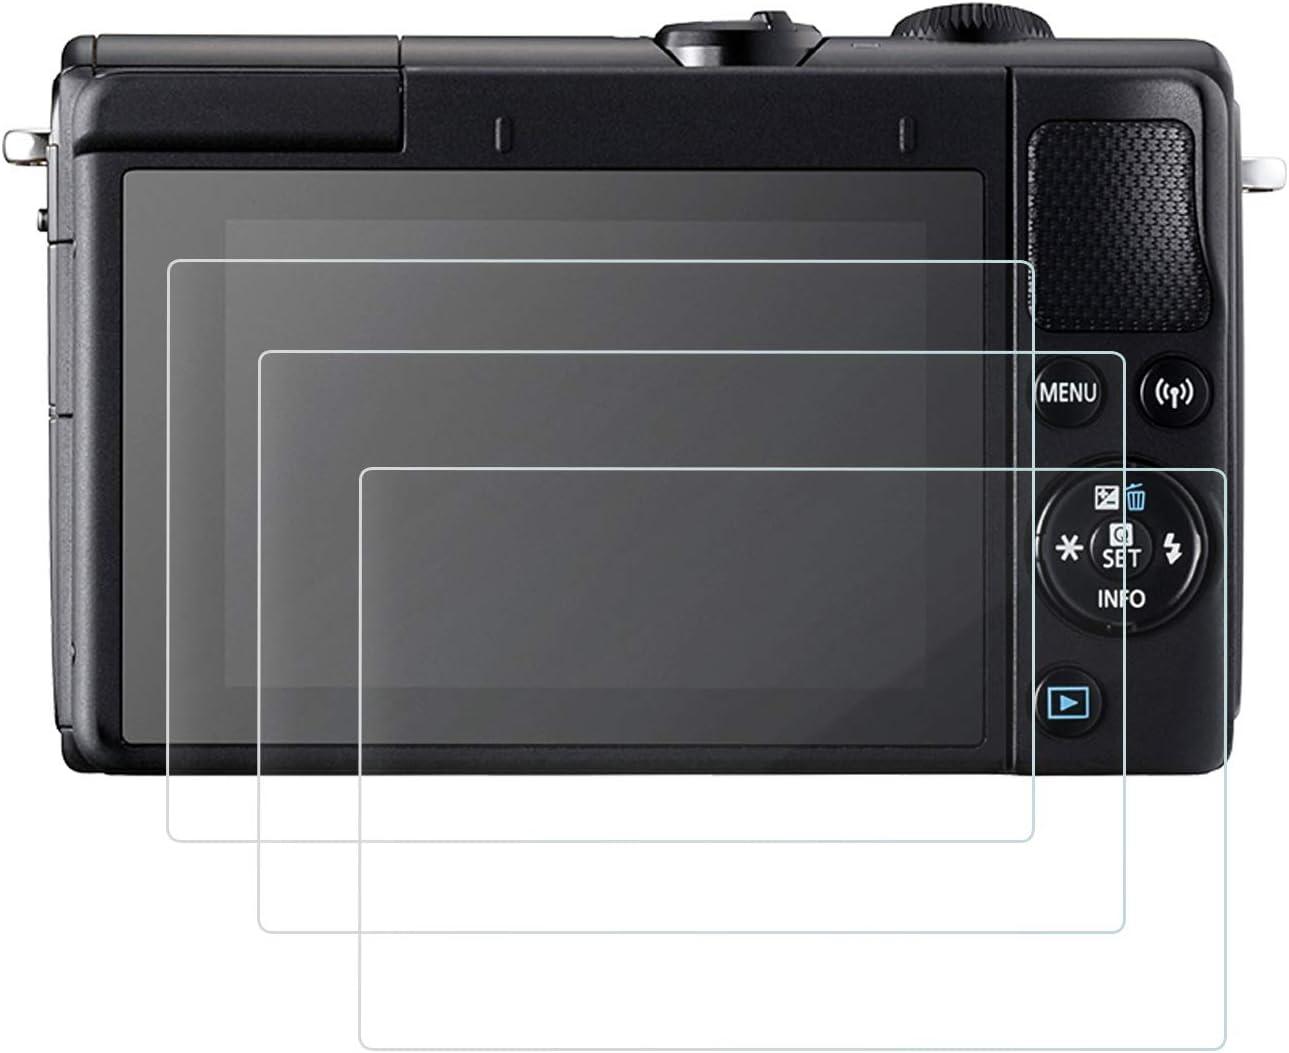 Futheda Displayschutzfolie Kompatibel Mit Eos M6 M50 Kamera